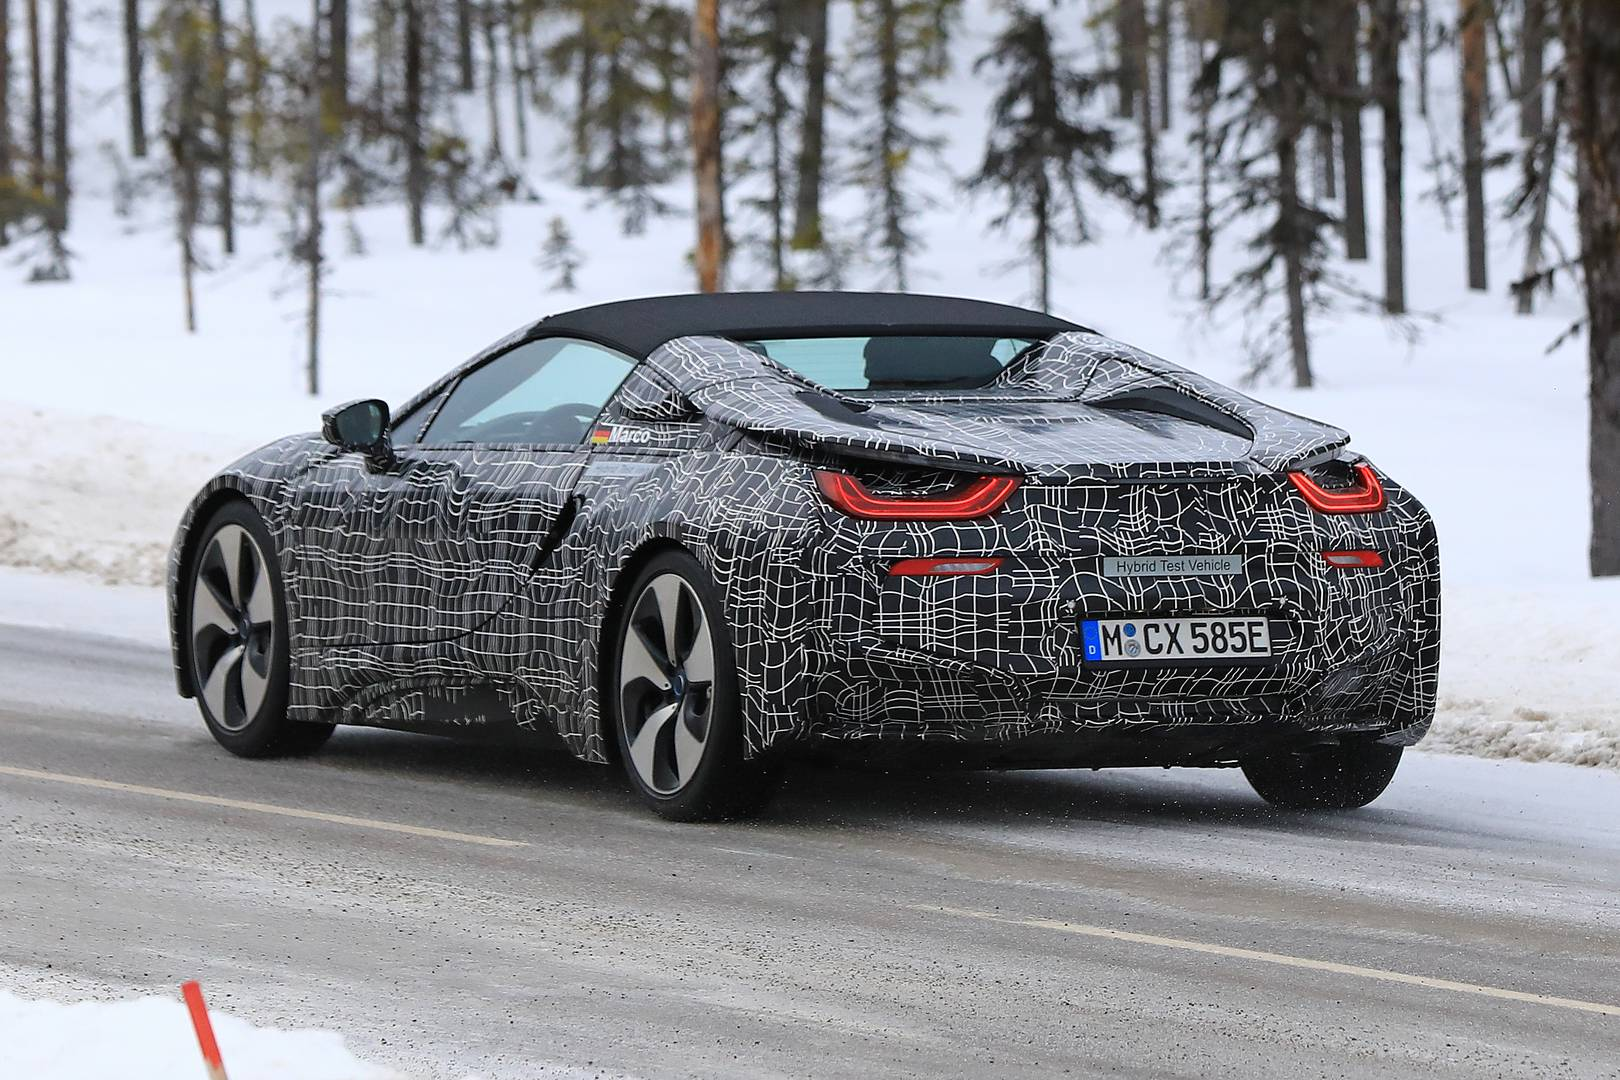 BMW-i8-Spyder-011.jpg